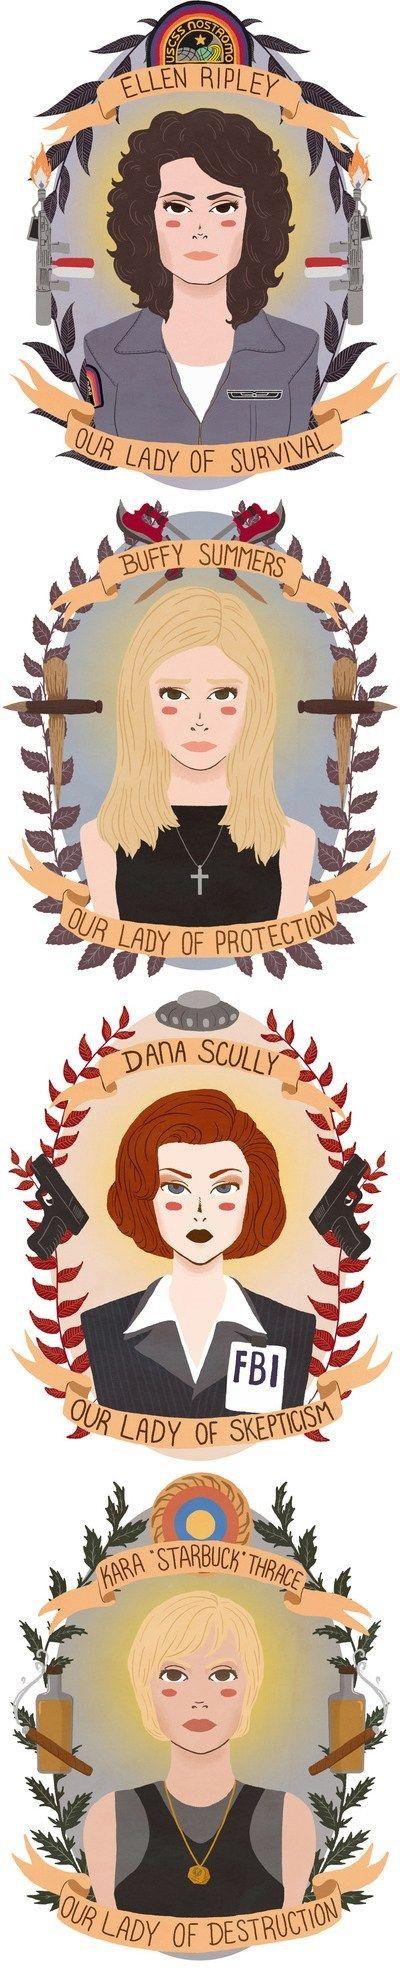 Patron Saints of Sci-Fi Heroines